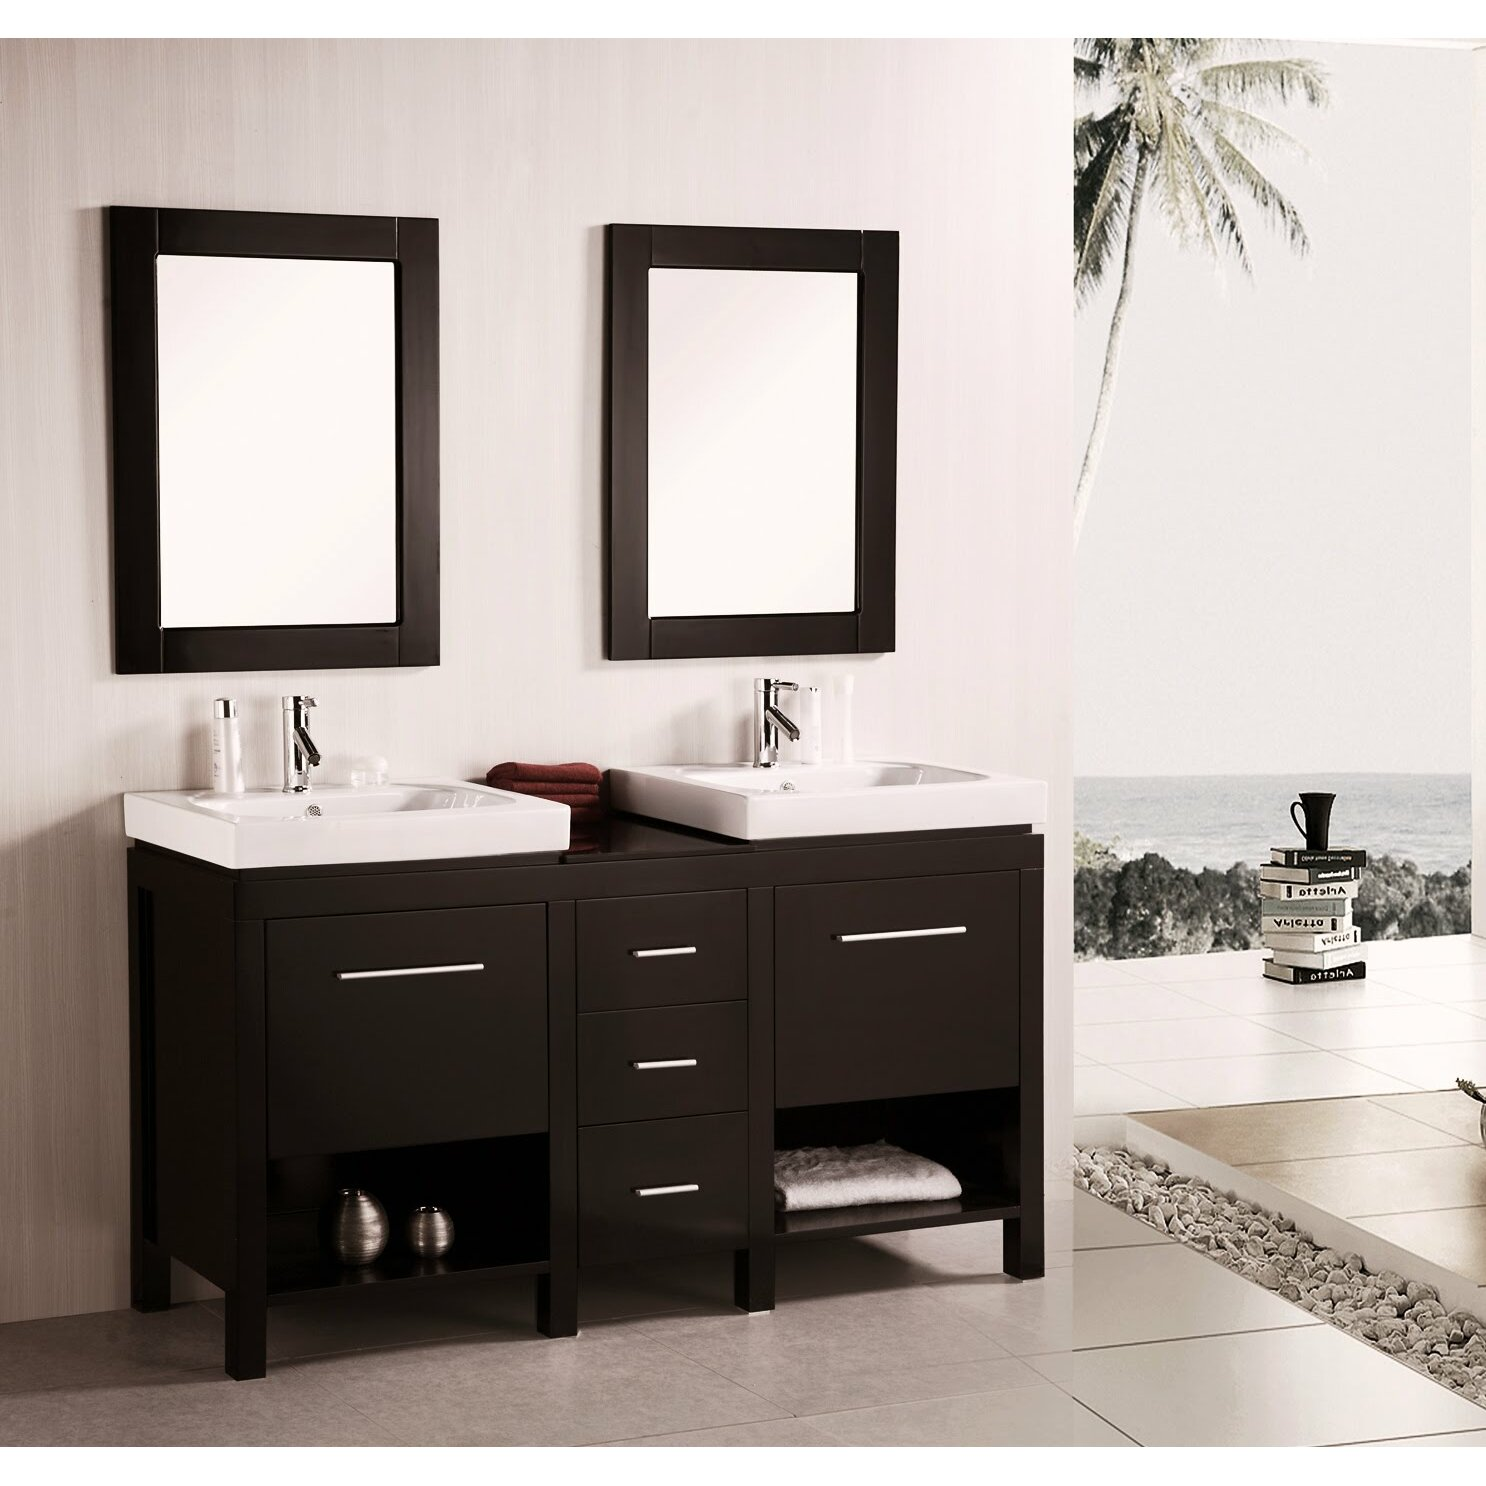 kokols 60 double bathroom vanity set with mirror On bathroom mirror set